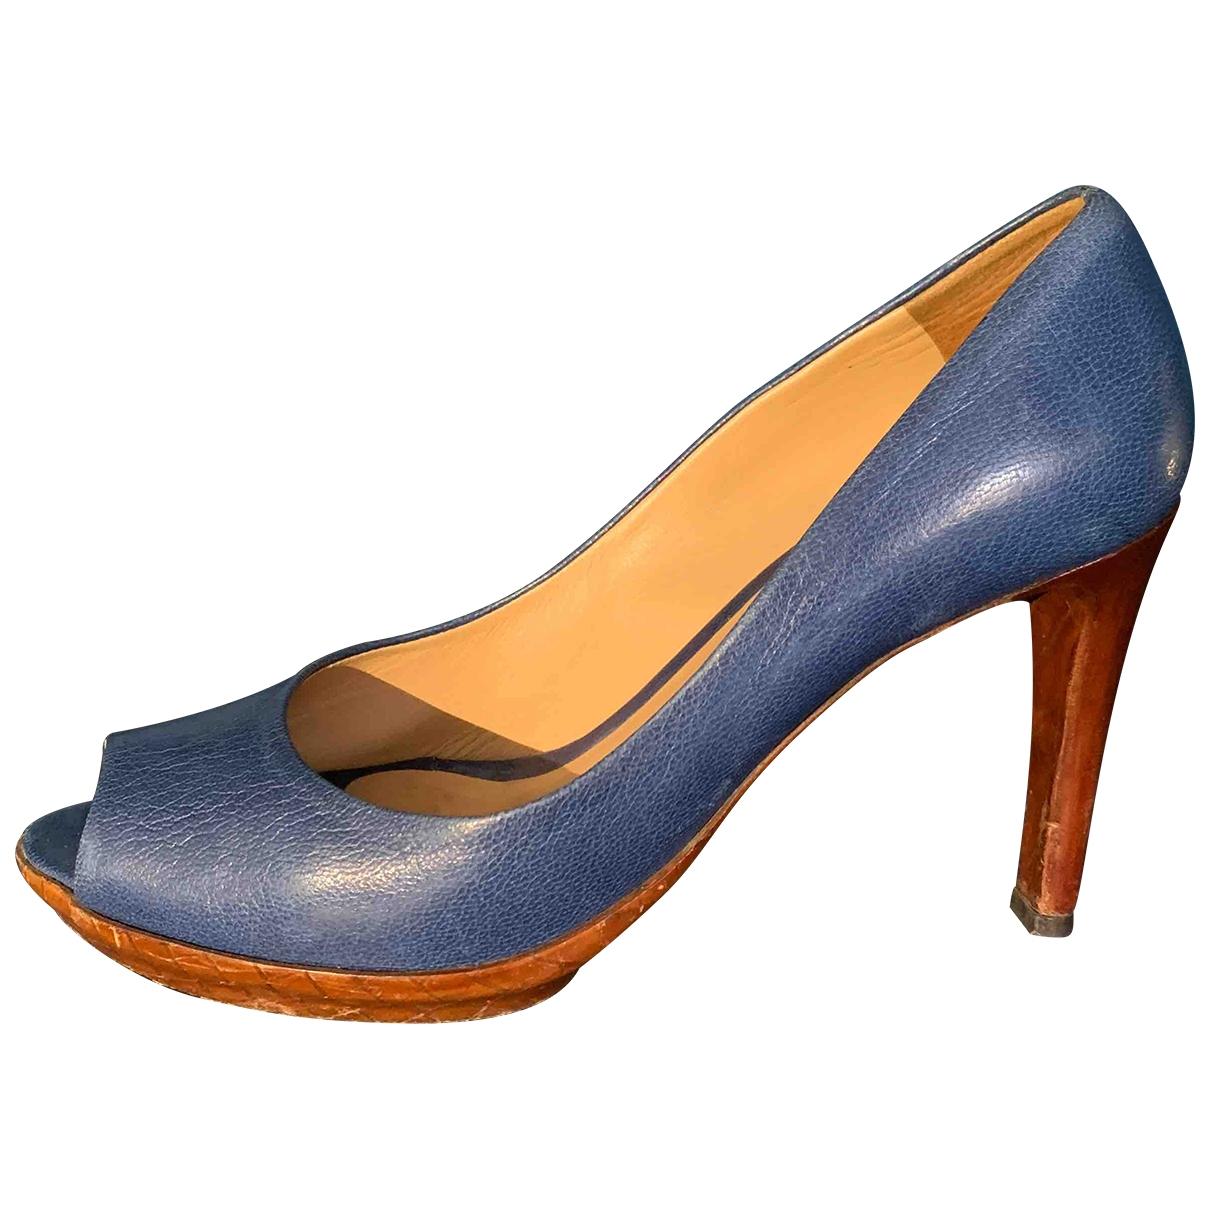 Bottega Veneta - Escarpins   pour femme en cuir - bleu